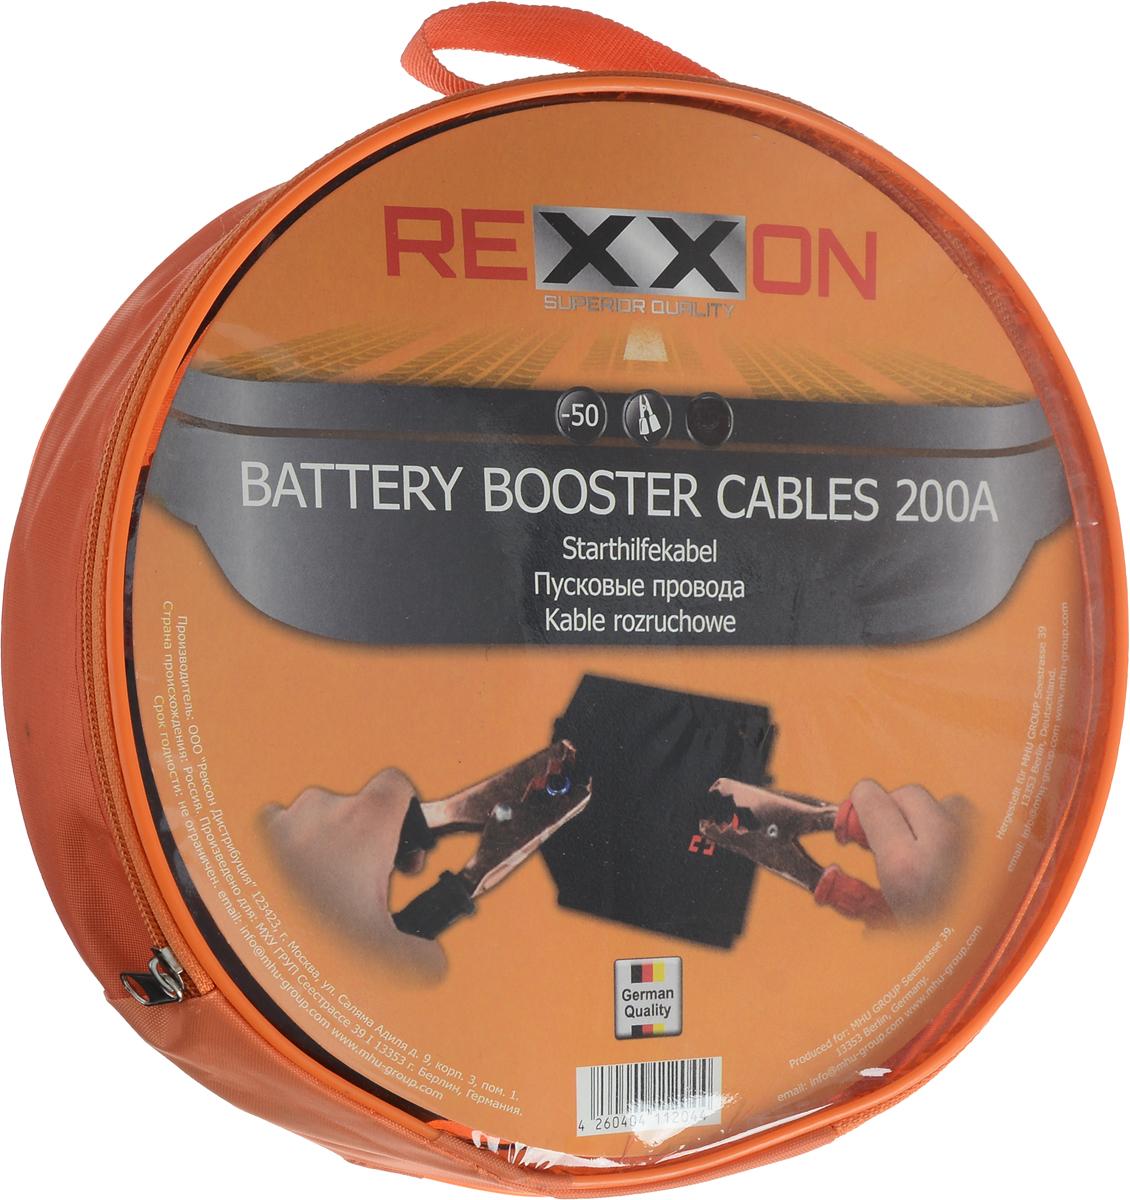 Провода вспомогательного запуска Rexxon